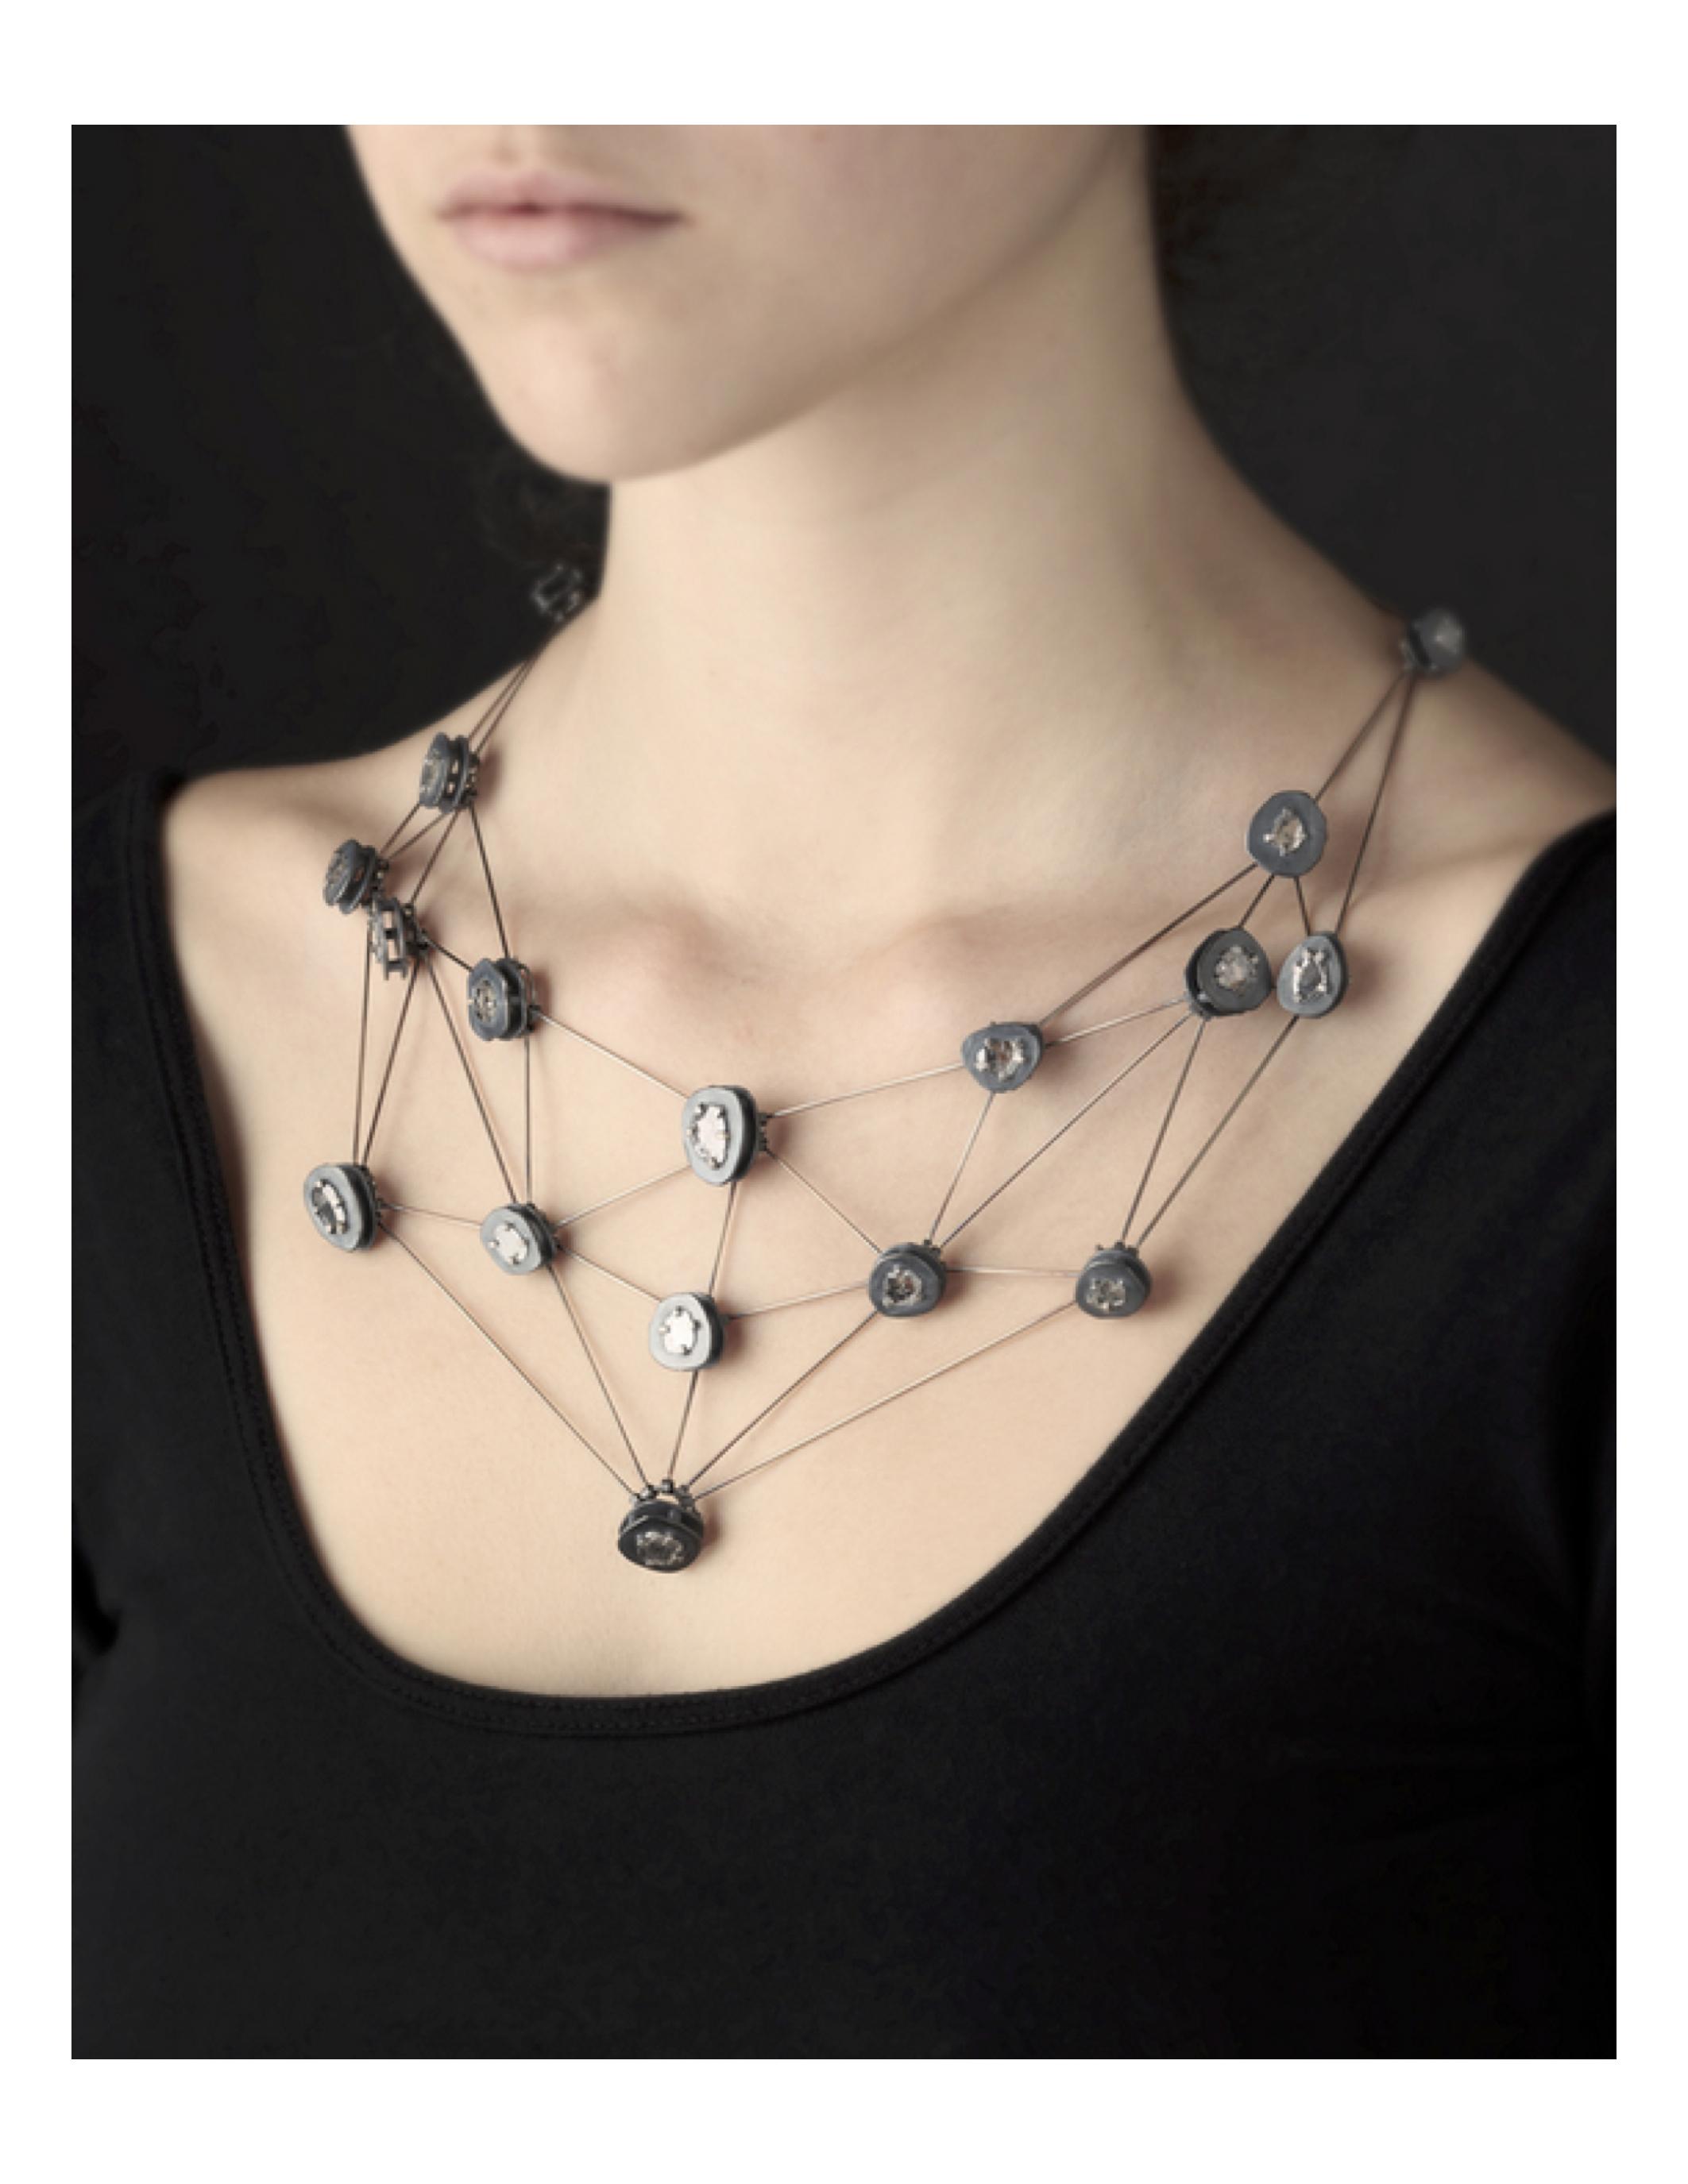 Diamond Web Necklace S. Enterline 2017.jpg